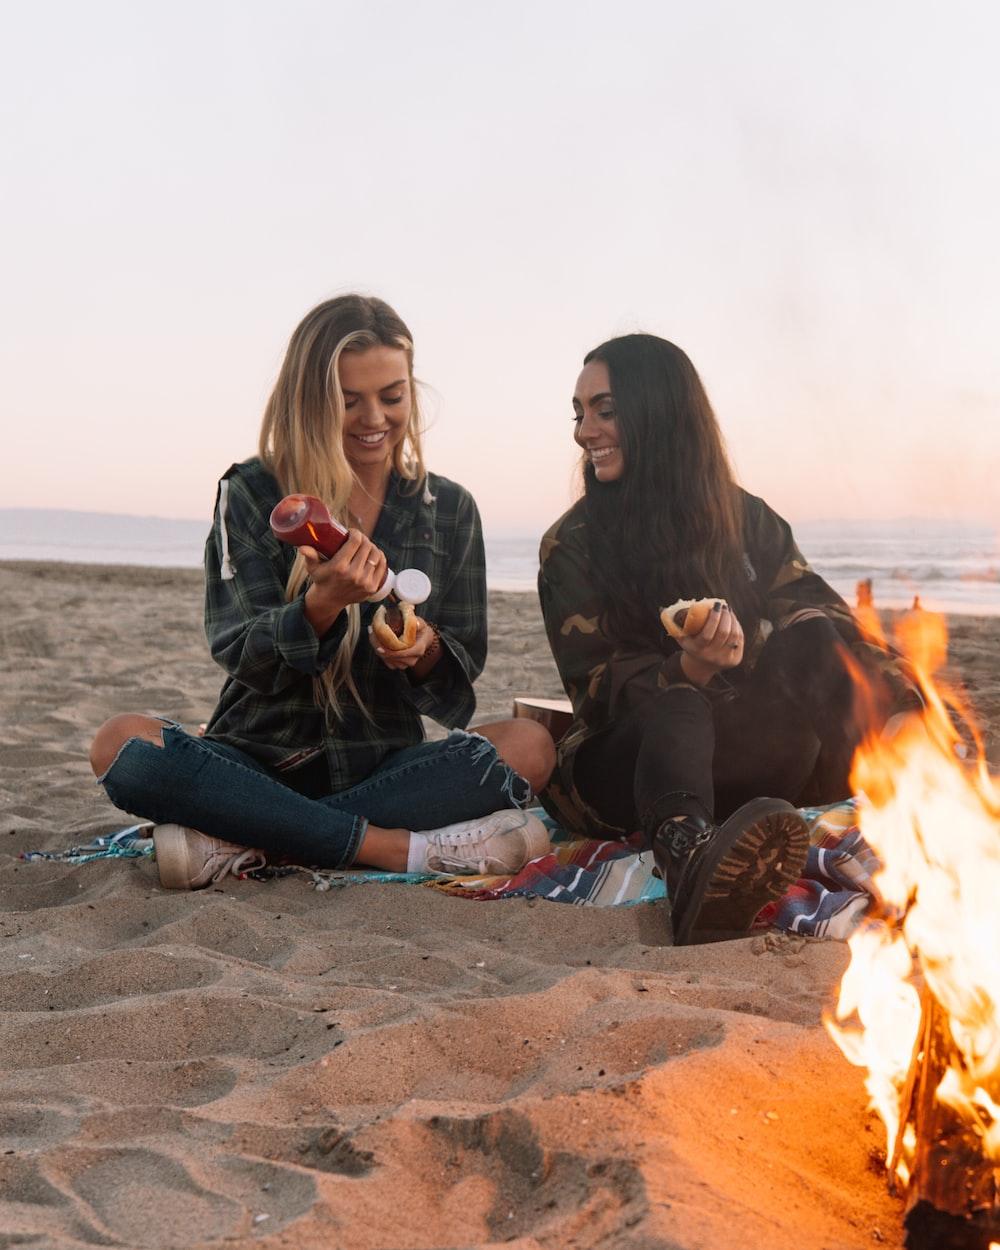 3 women sitting on brown sand near bonfire during daytime